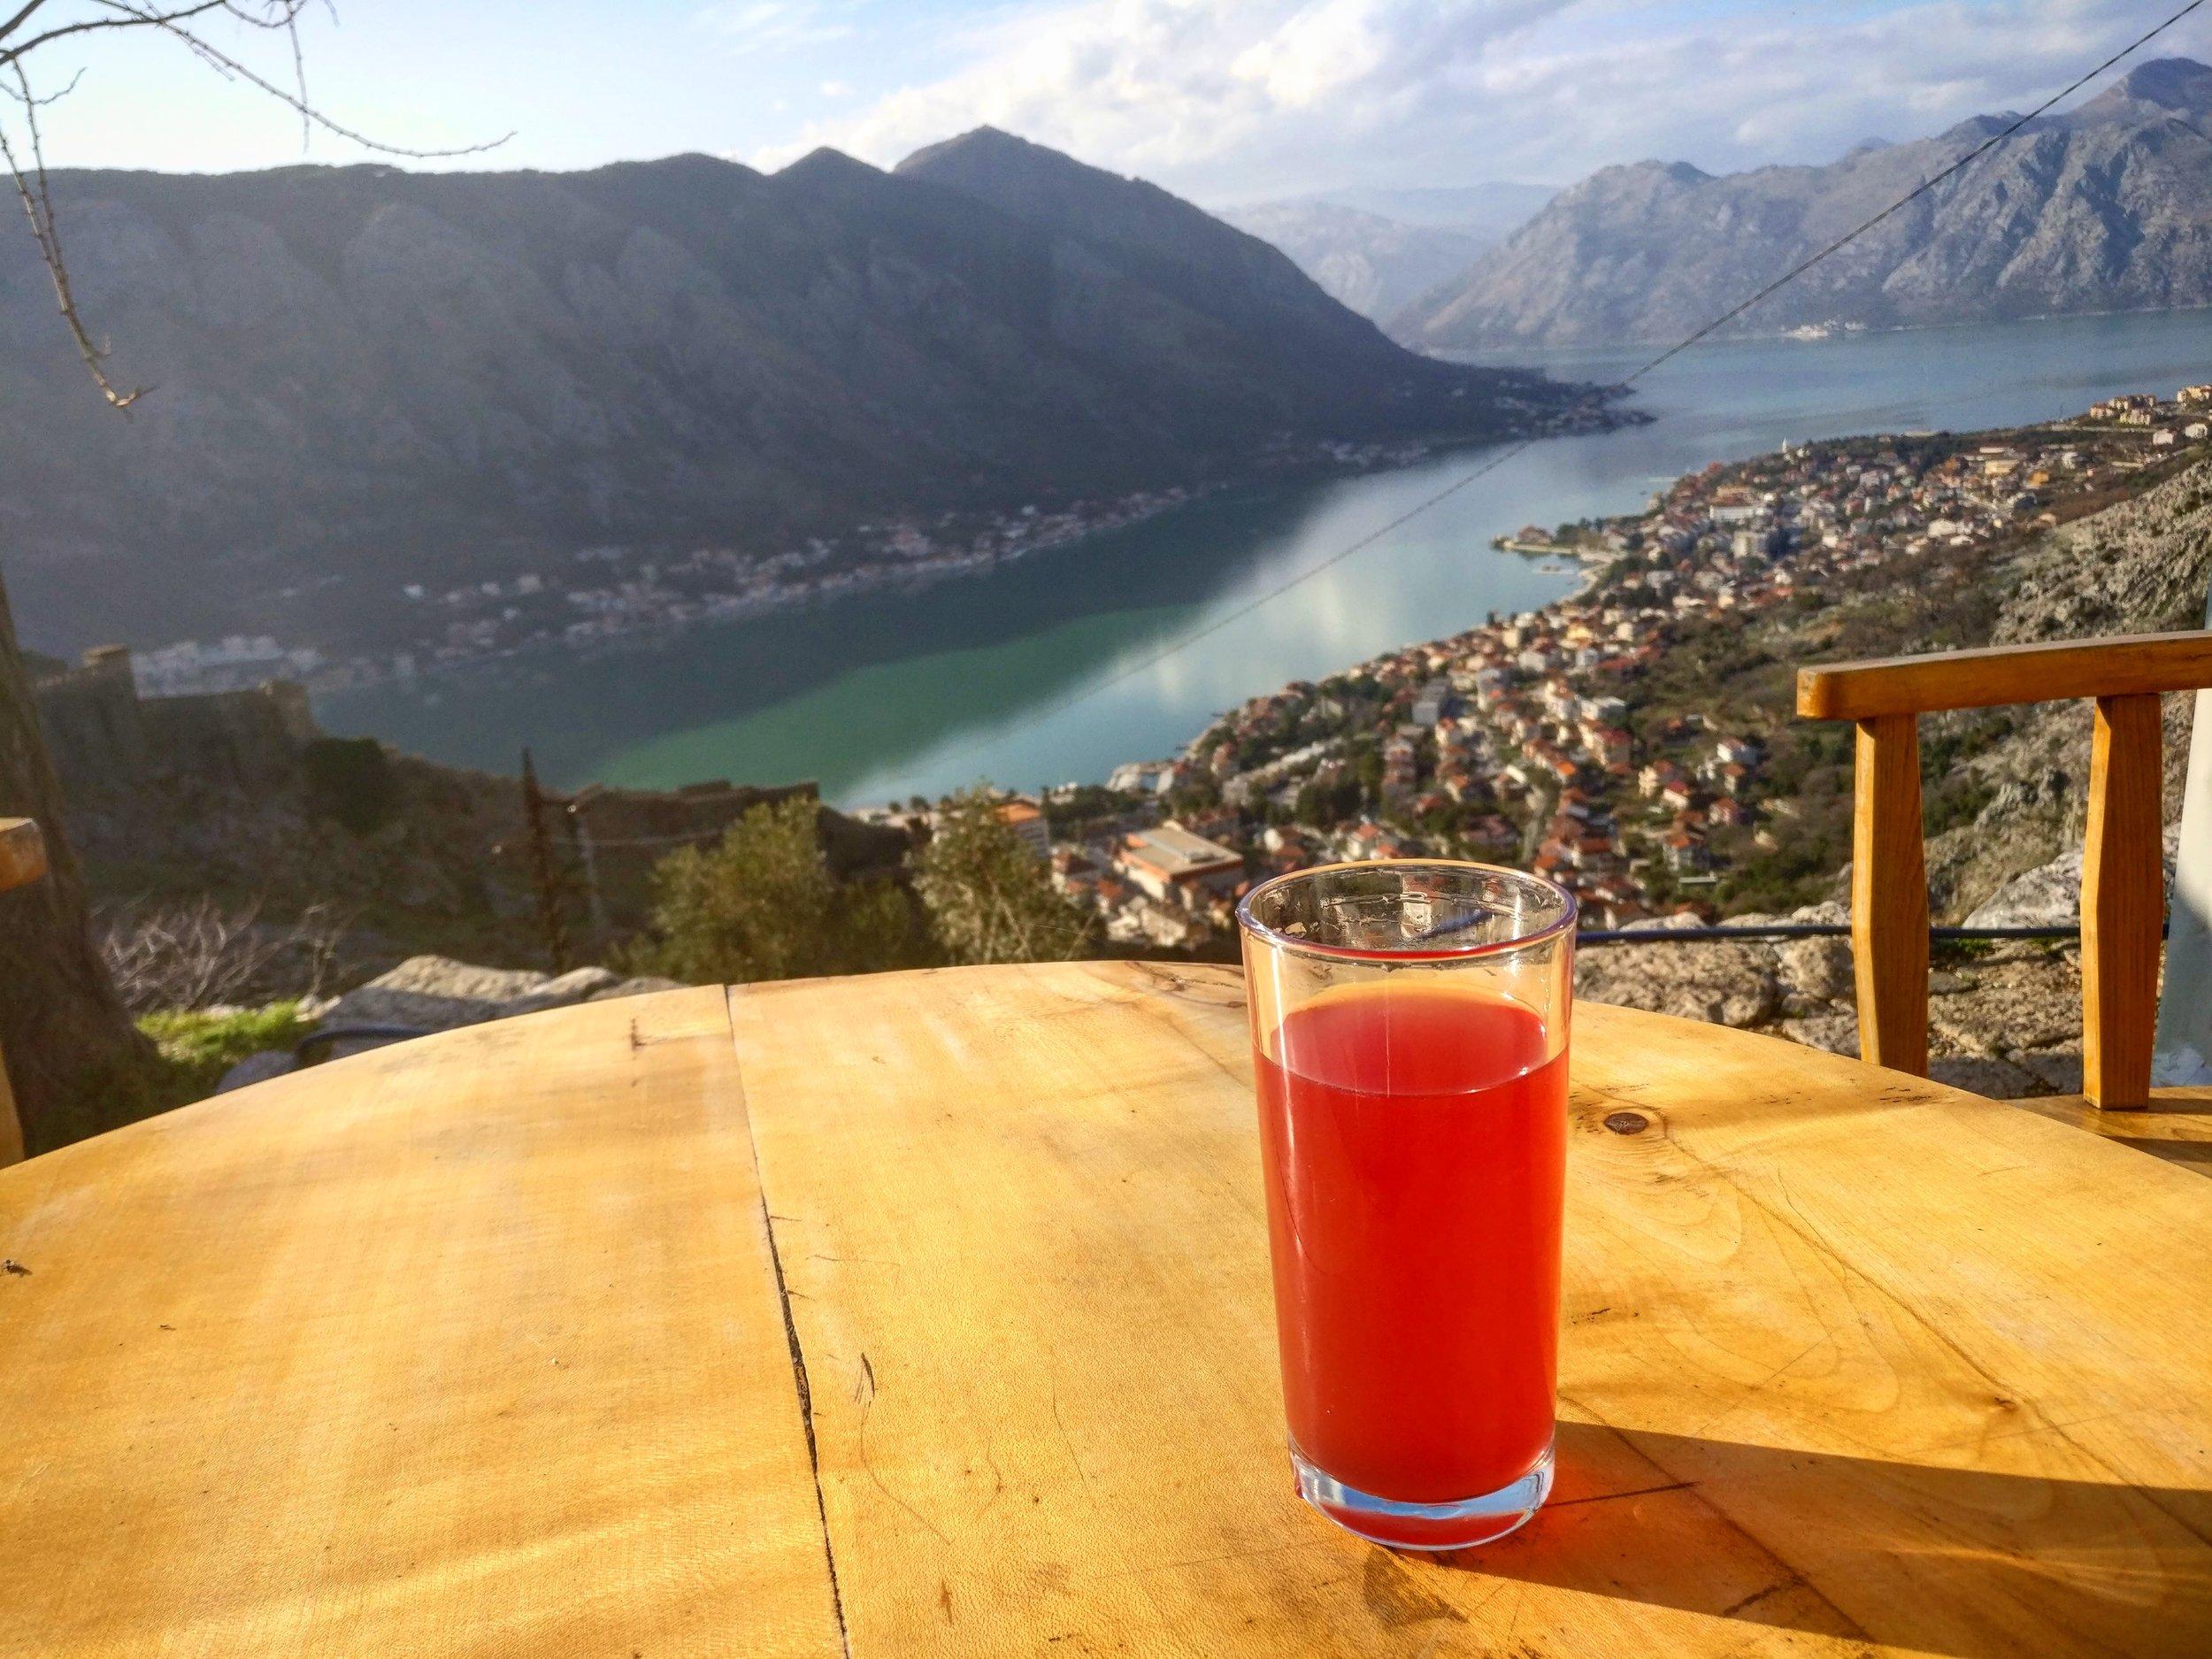 Pomegranate juice at the farmhouse